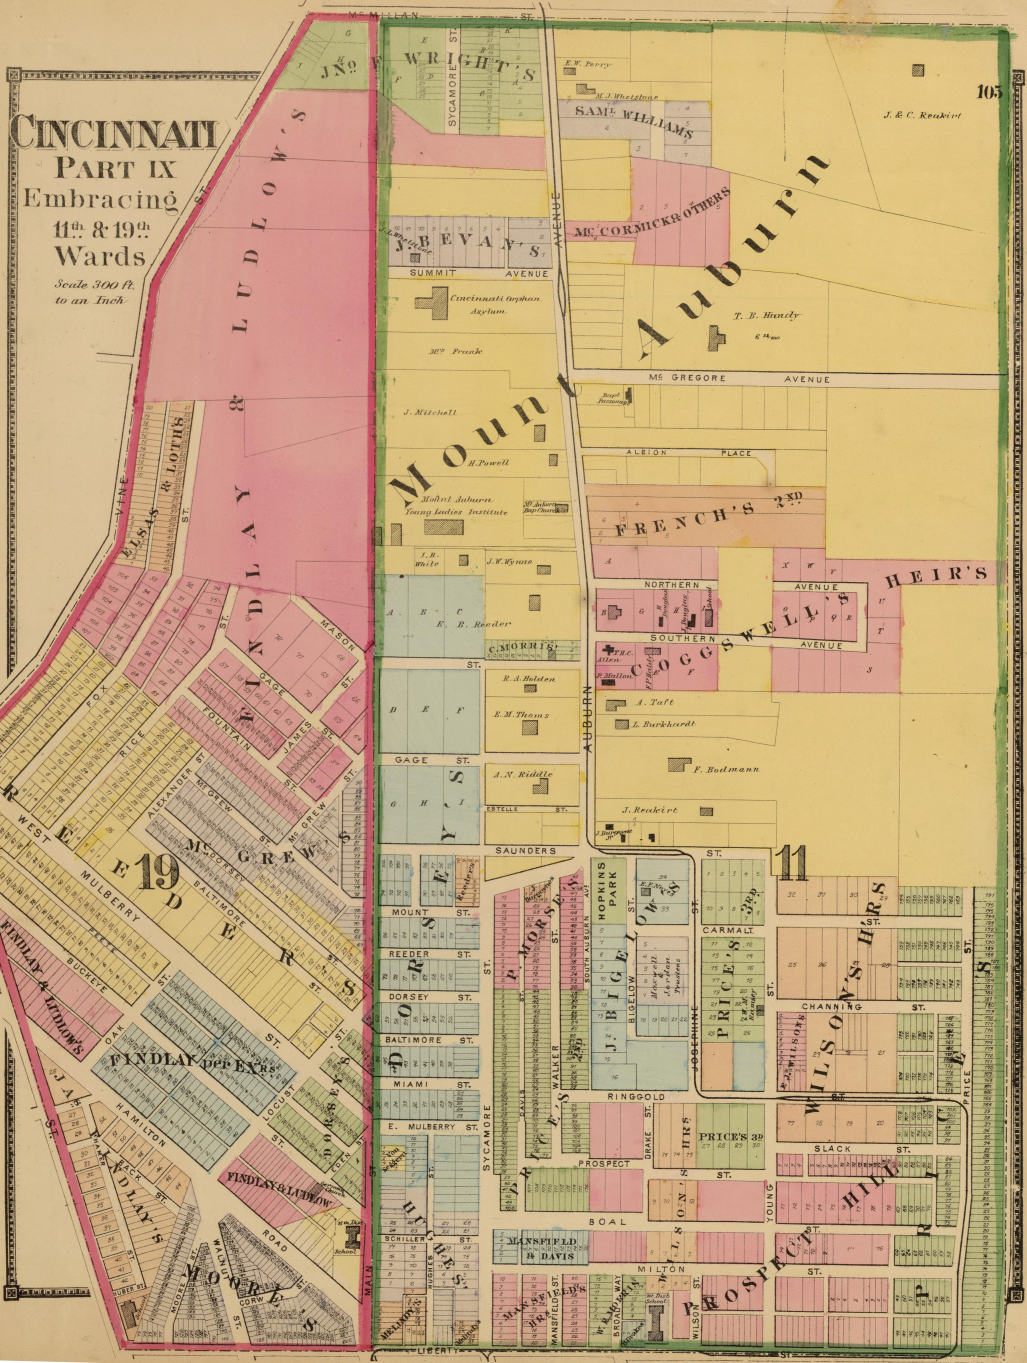 Mount Auburn Historic District - Wikipedia on map of university of louisiana lafayette campus, map of cinn ohio, uc campus map ohio, map off cinn oh, map showing ohio counties,